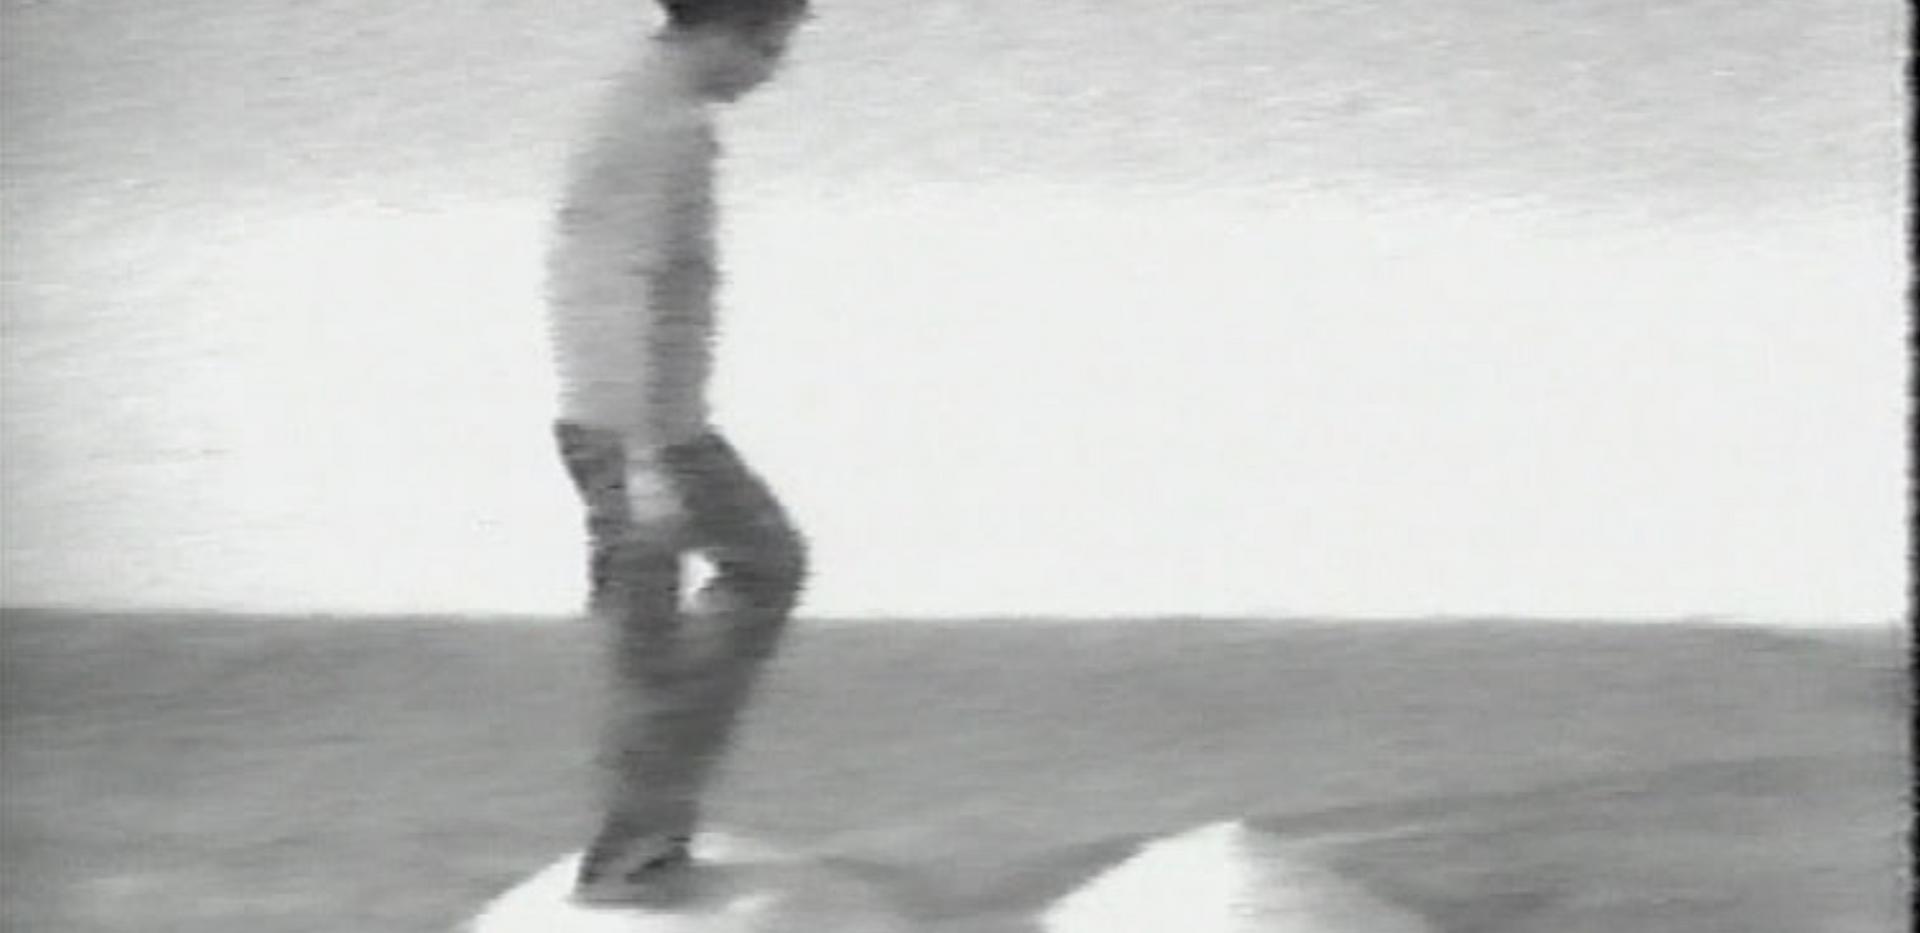 Micha Ullman, Place, 1975. Still from single-channel video. Photo: Uri Bar Zemer.